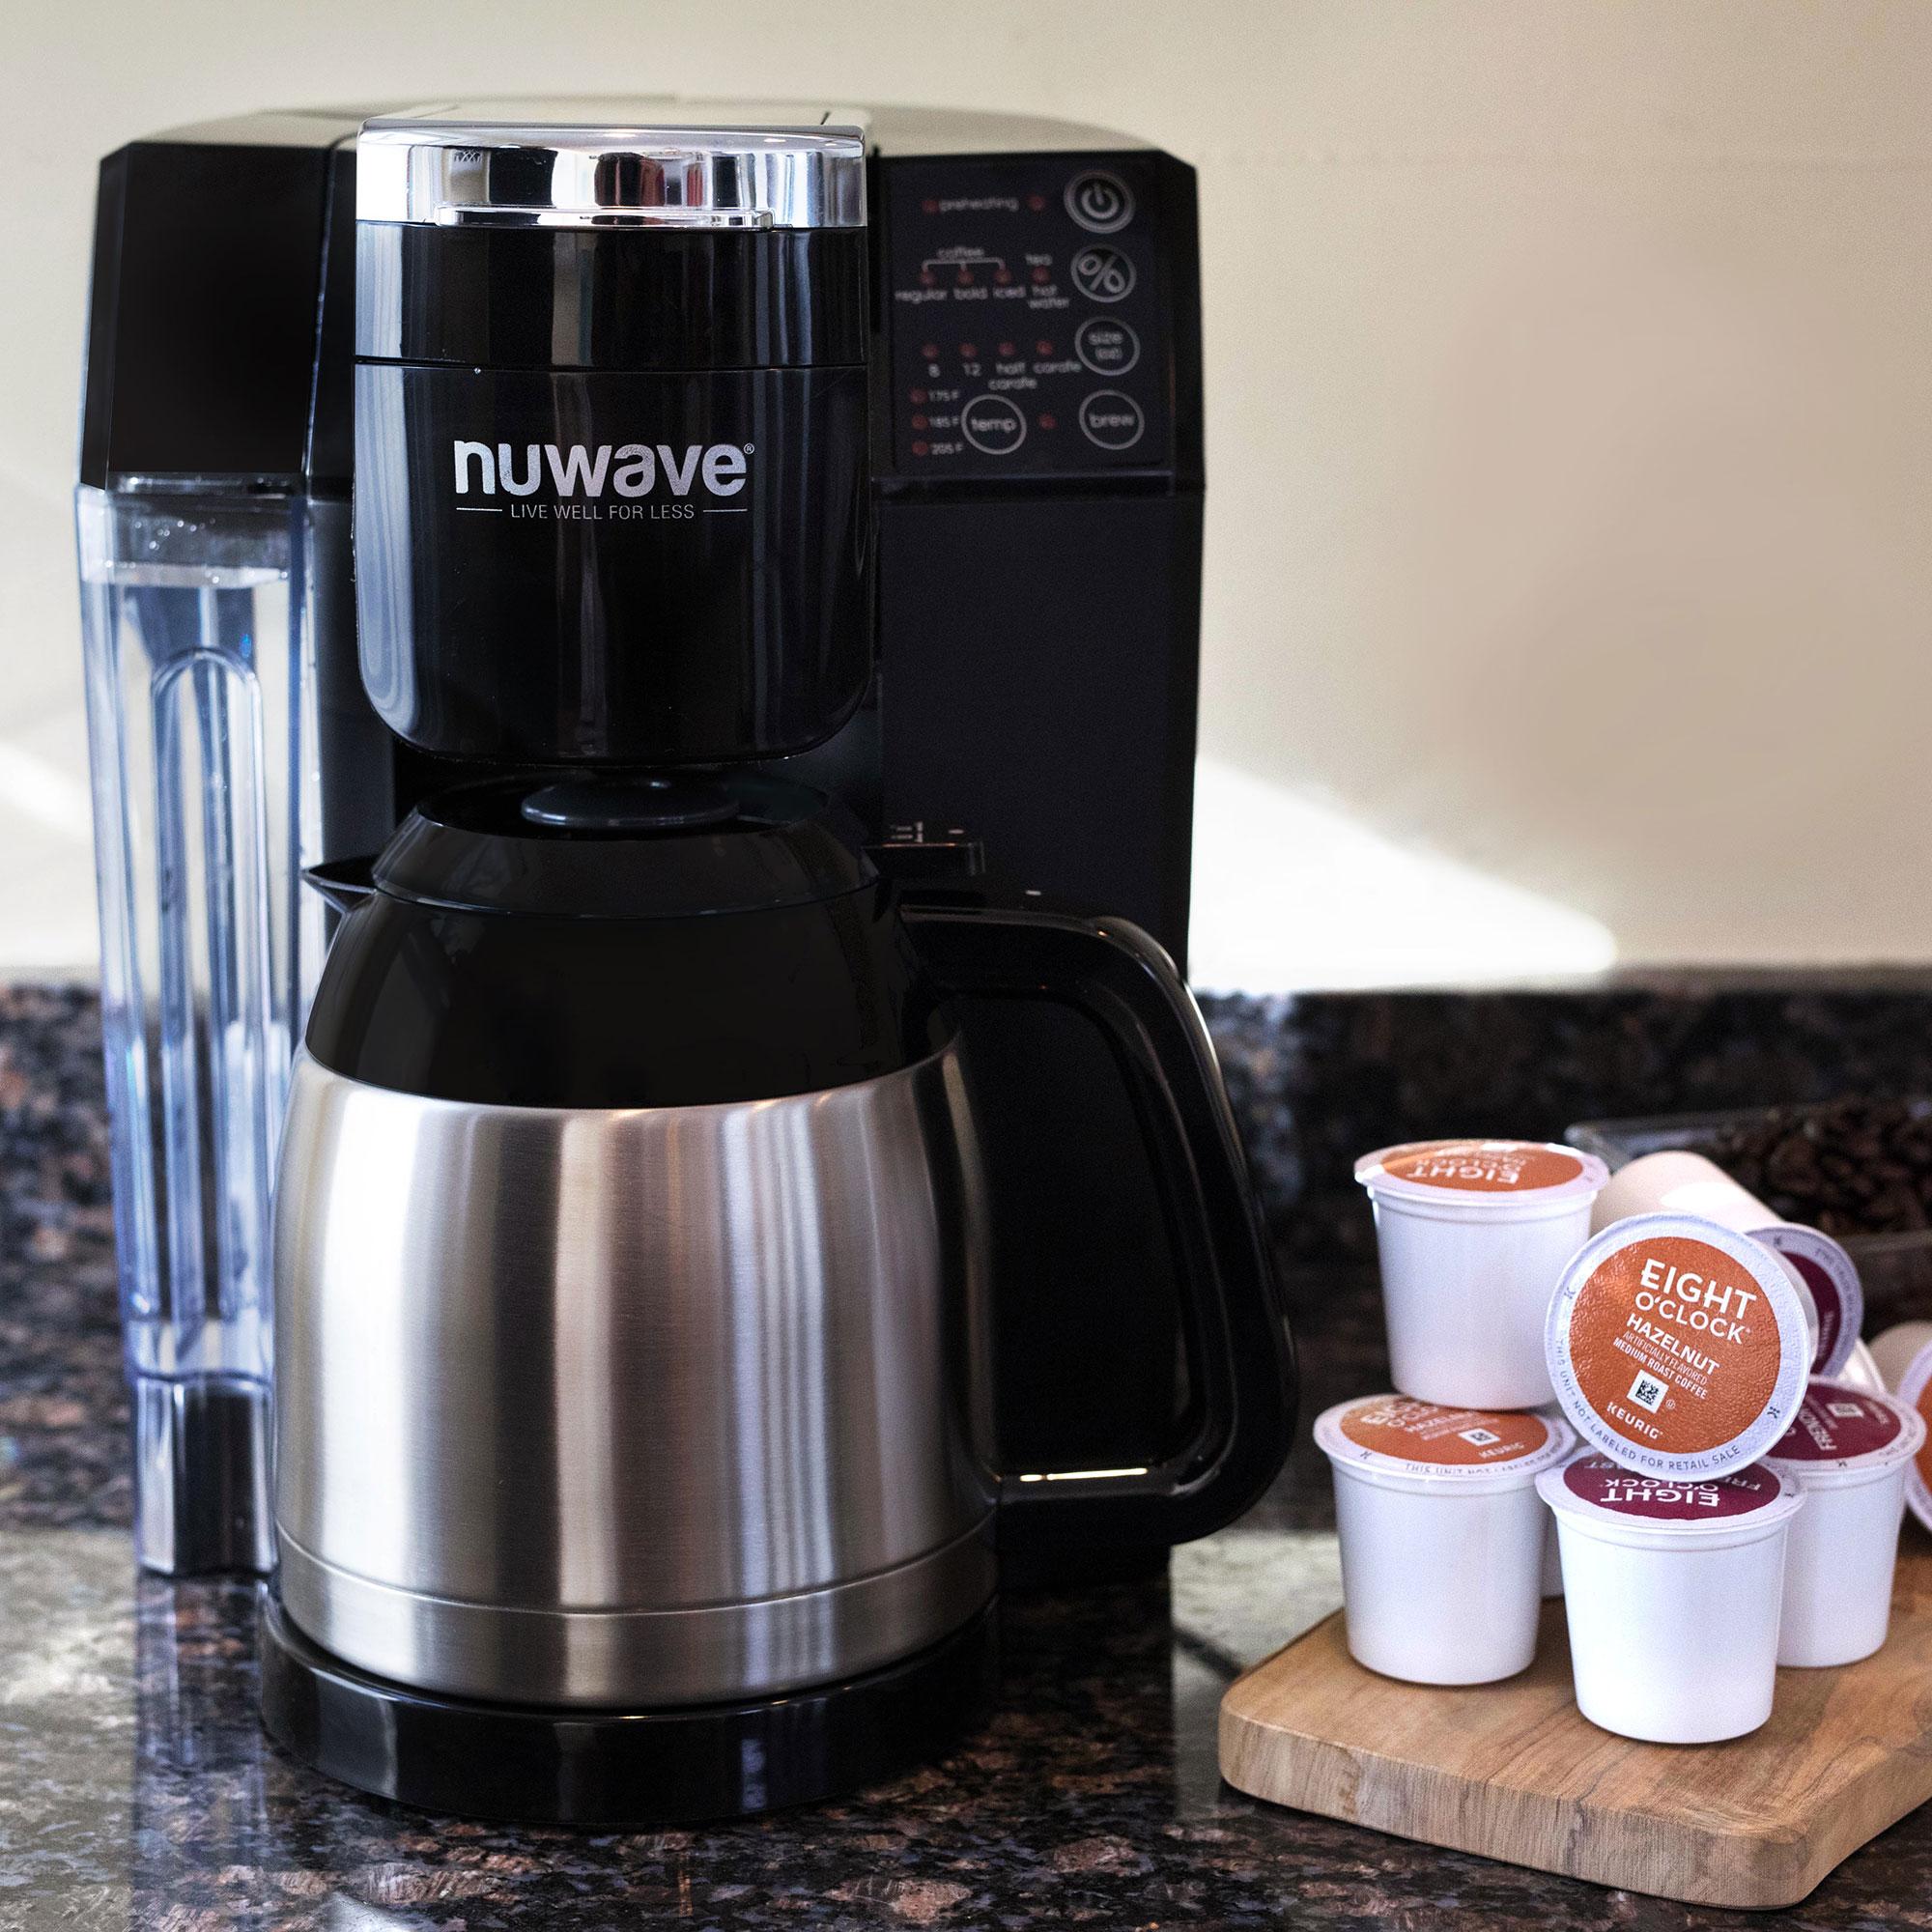 Nuwave Bruhub Single Servefull Pot Smart Coffeemaker Machine System